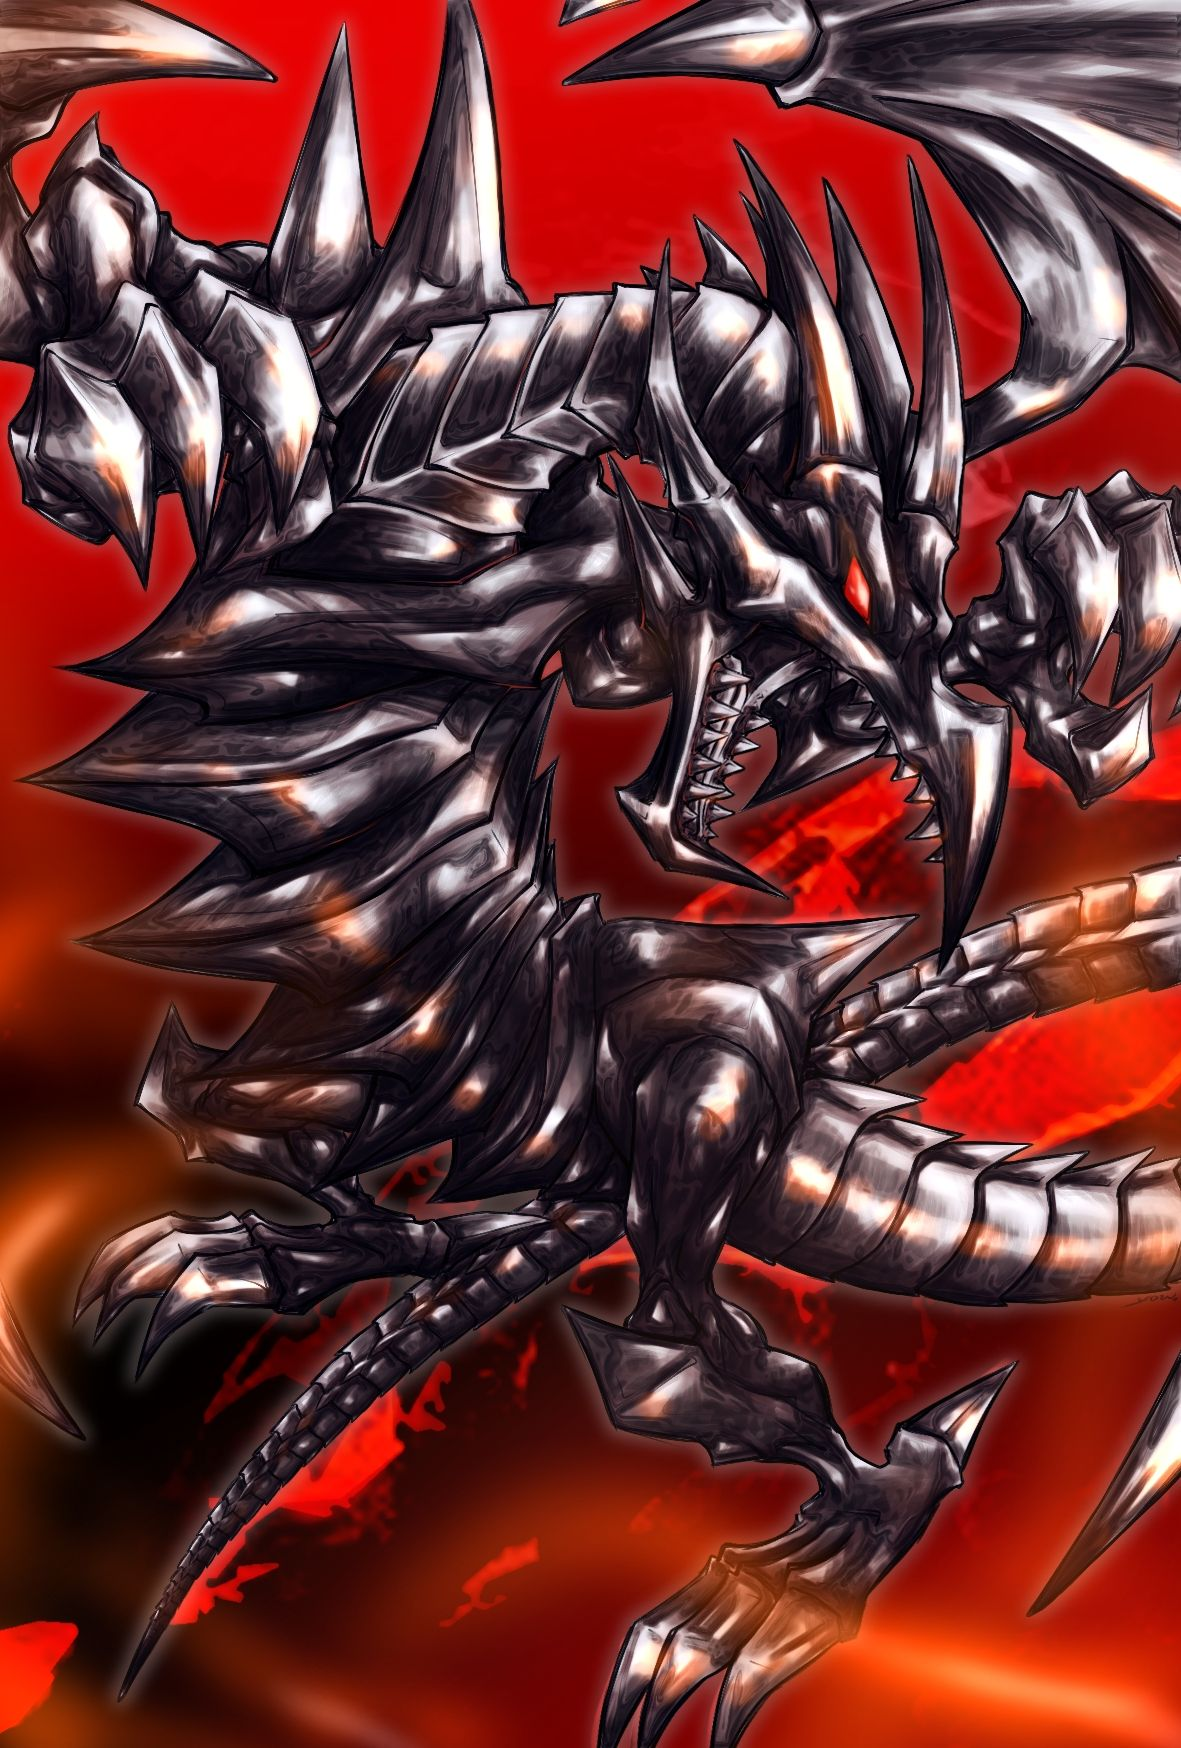 Red Eyes Black Dragon Wallpaper Wallpapersafari Black Dragon Eyes Wallpaper Red Eyes